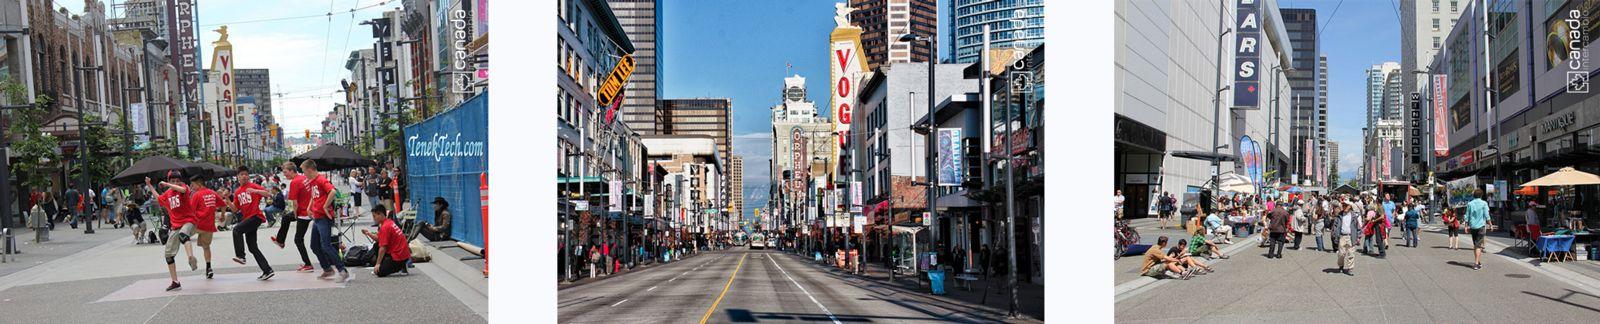 Ponto turistico em Vancouver, Granville Island Street